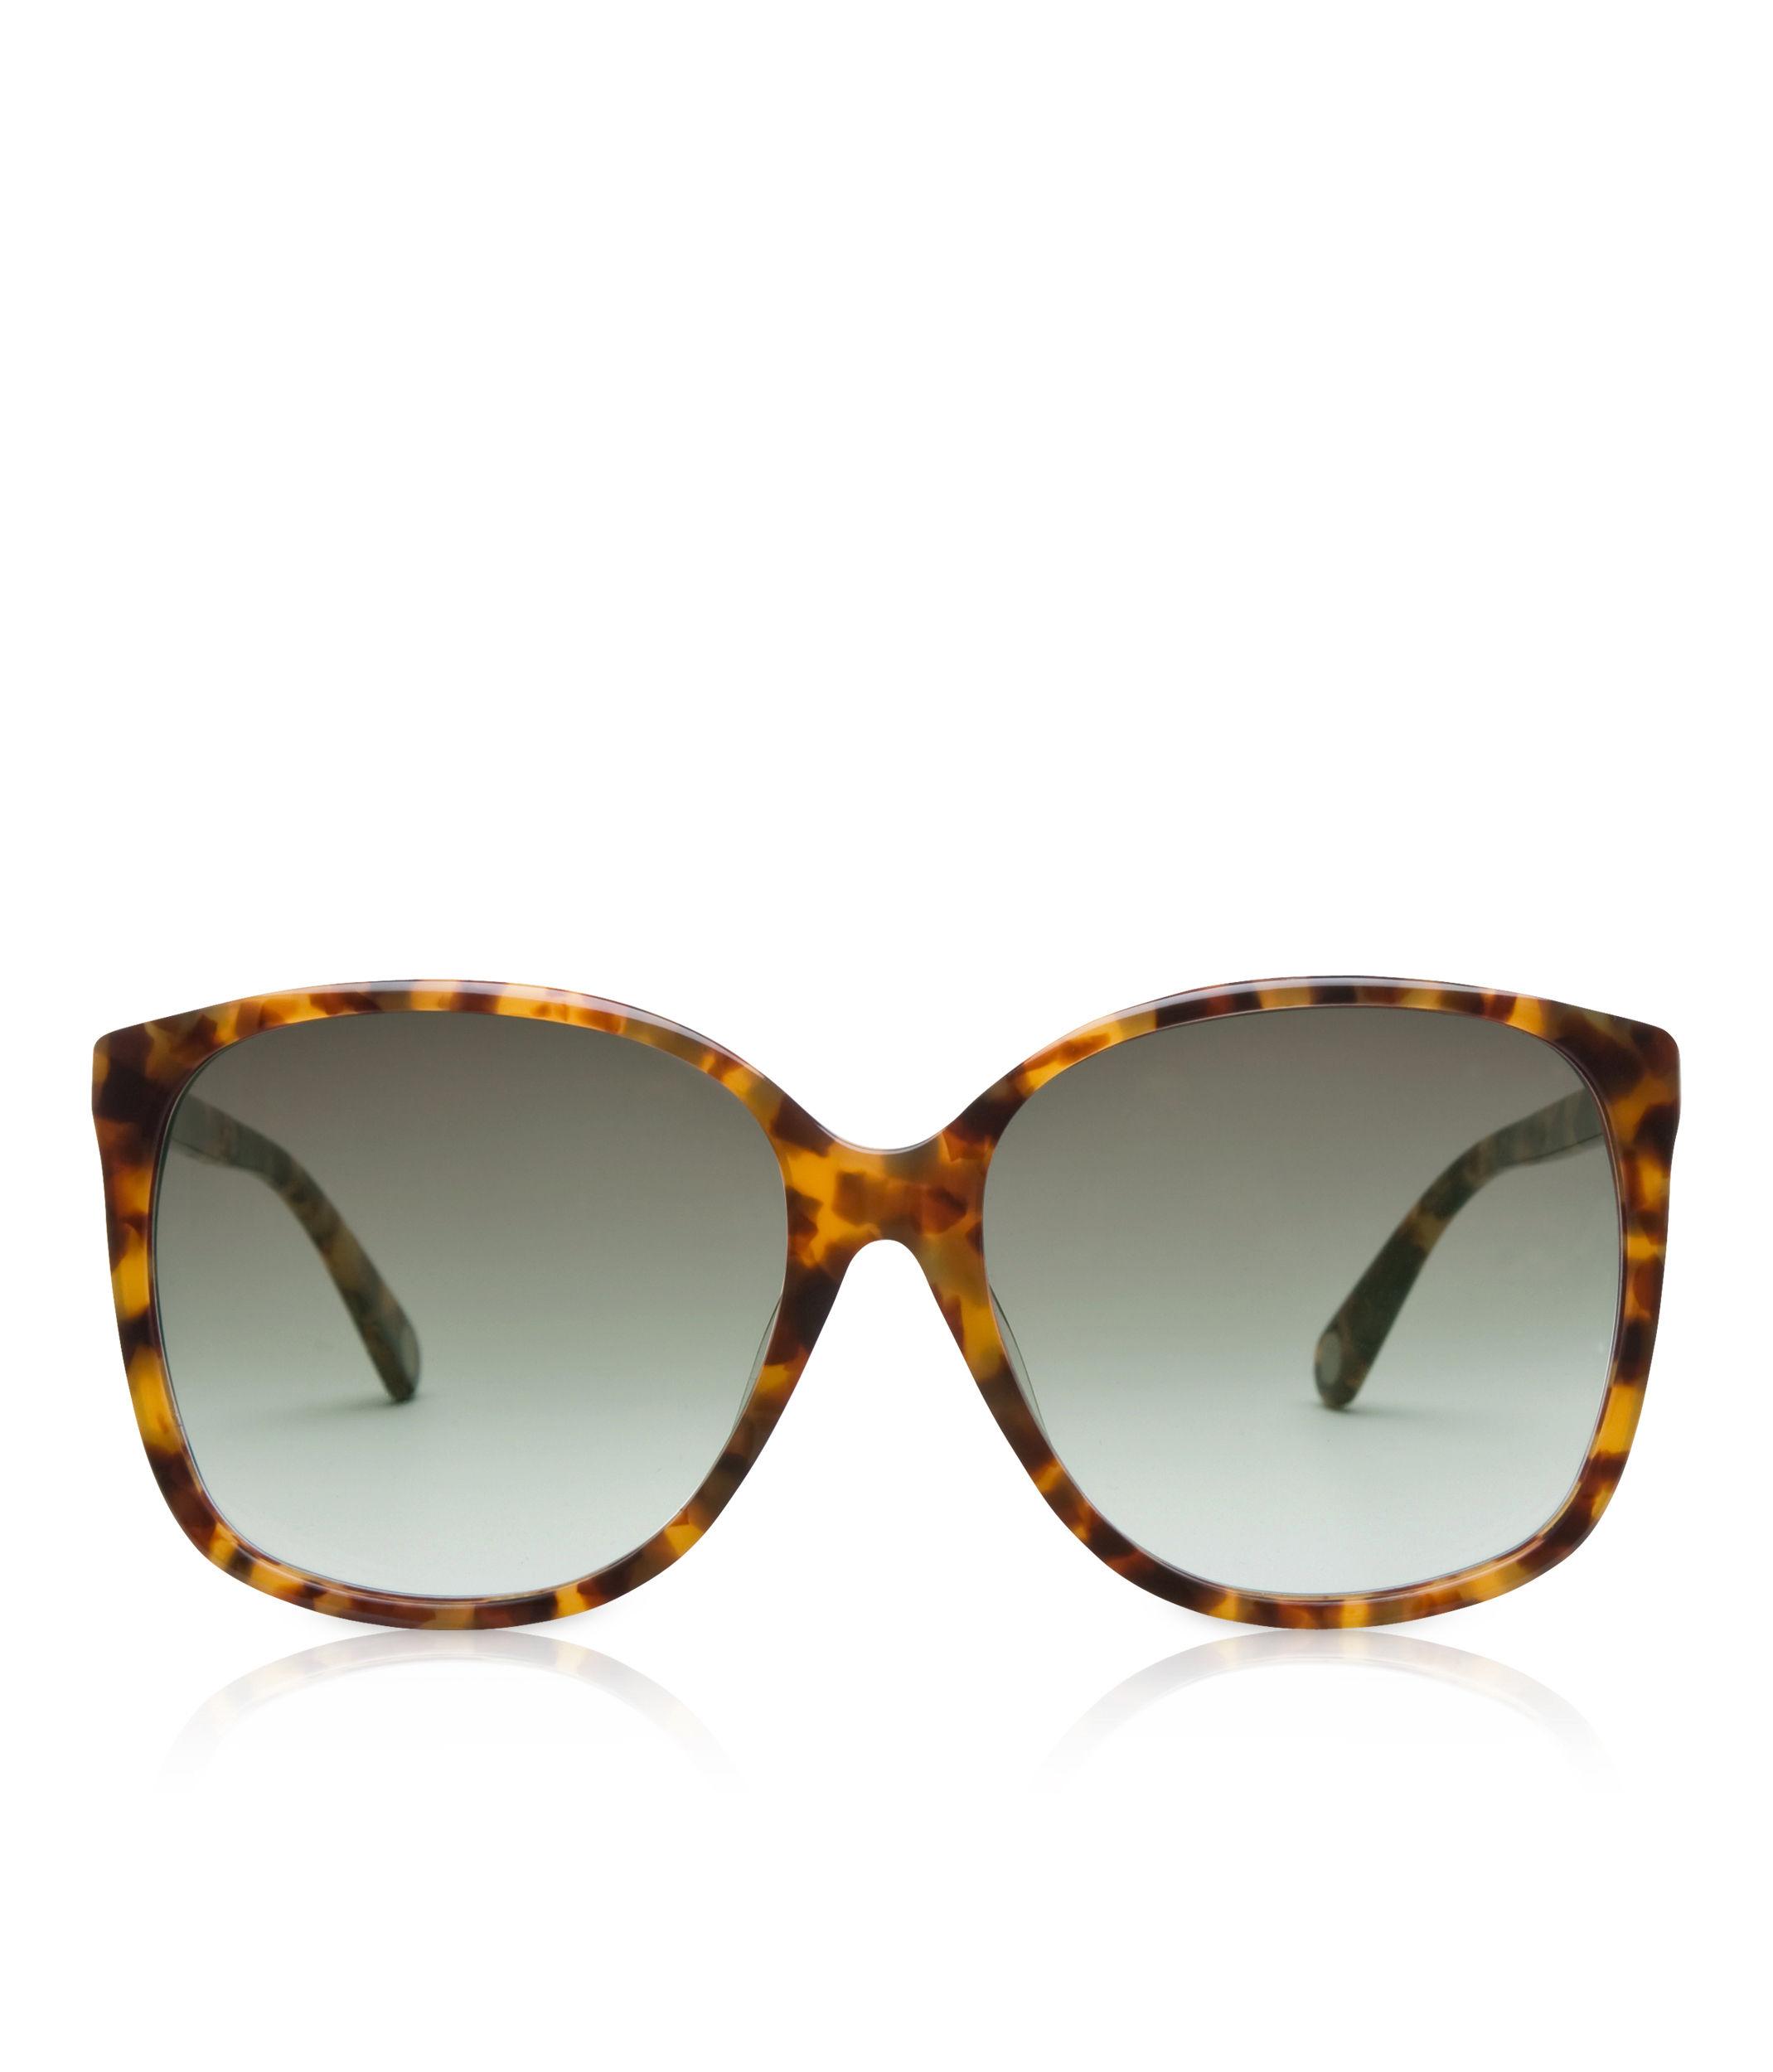 b7c3f2a7d7e Lyst - Henri Bendel Socialite Oversized Square Sunglasses in Brown